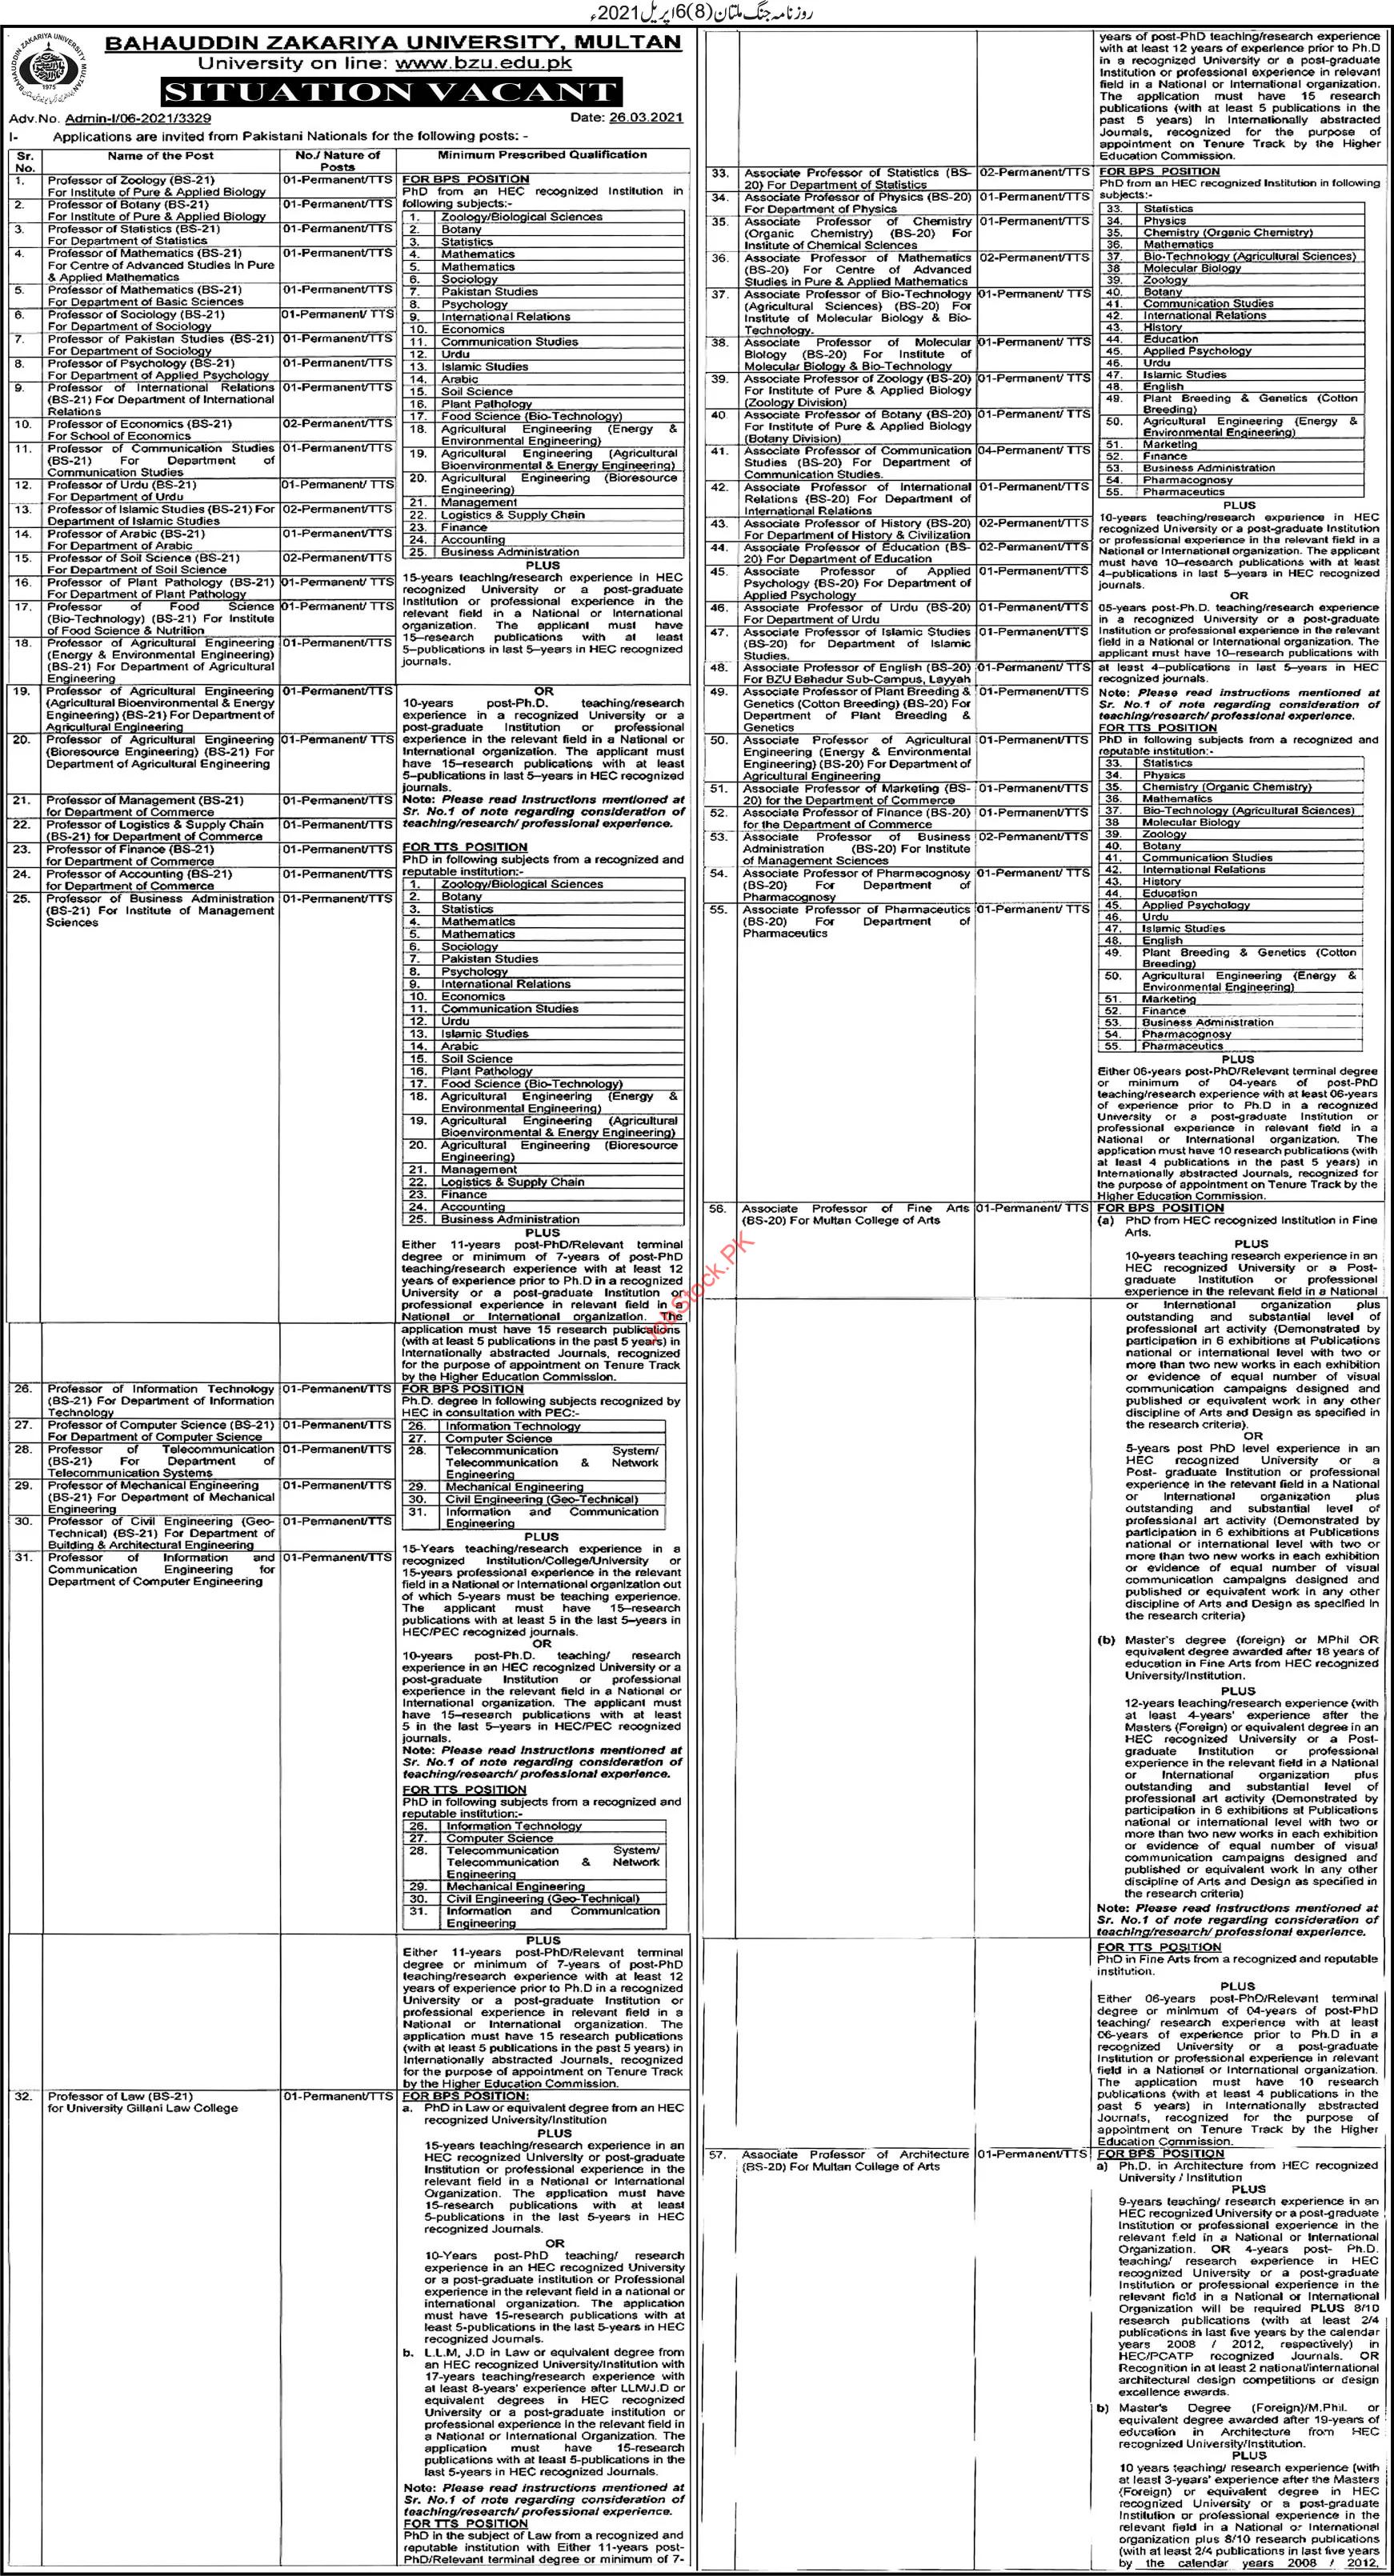 Professor Lecturer Jobs In Bzu Multan 2021 Bzu Teaching Faculty Jobs In Multan